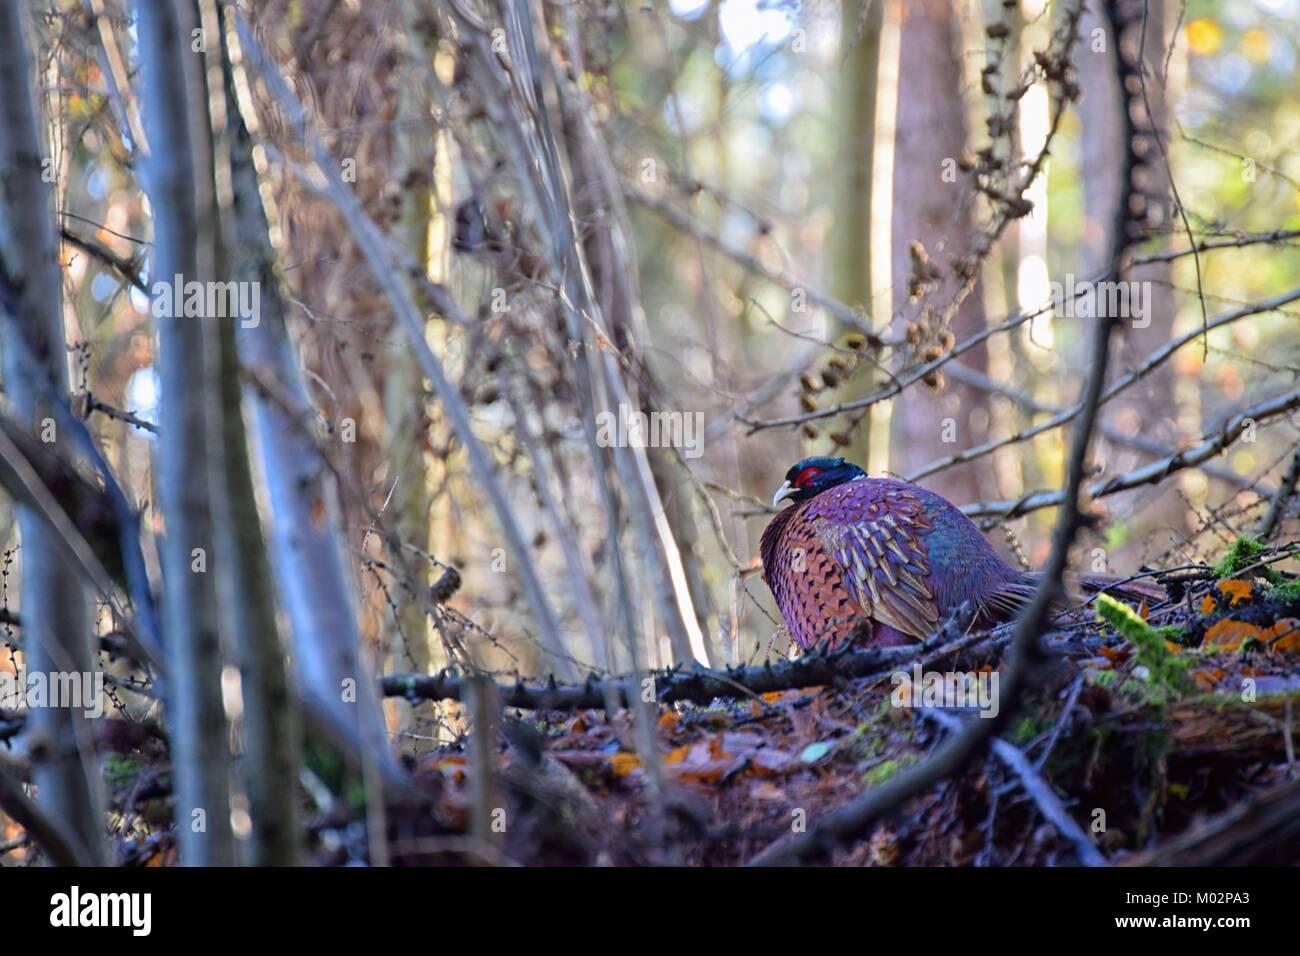 Pheasant basking in the sun - Stock Image